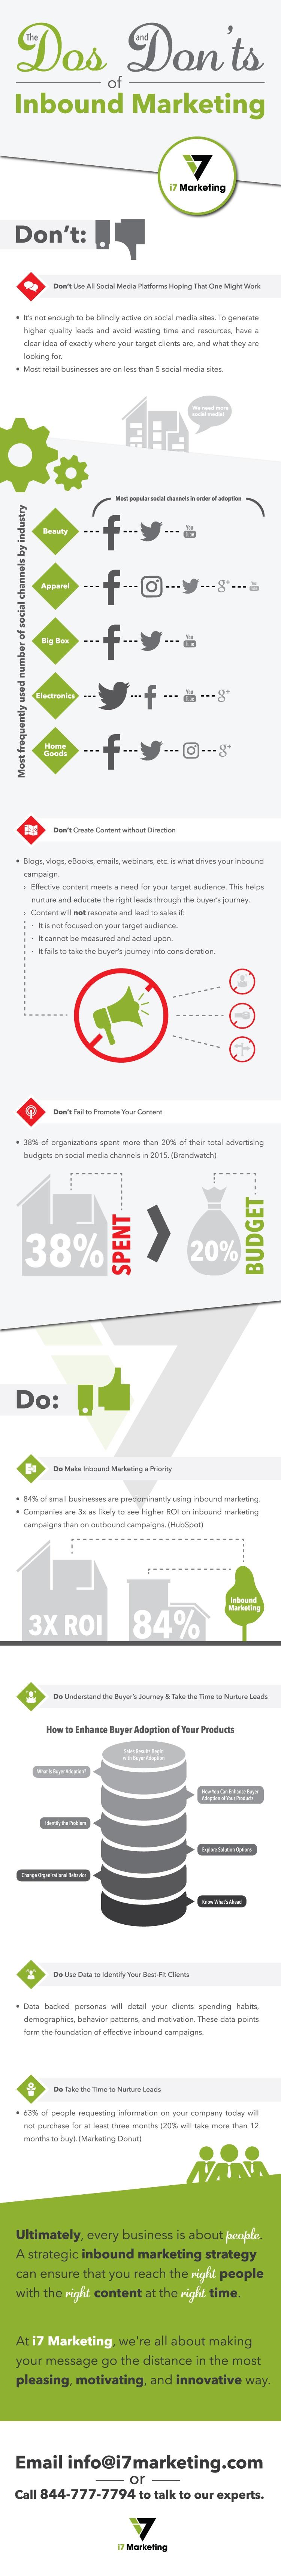 Inbound Markeitng Guidelines Infographic